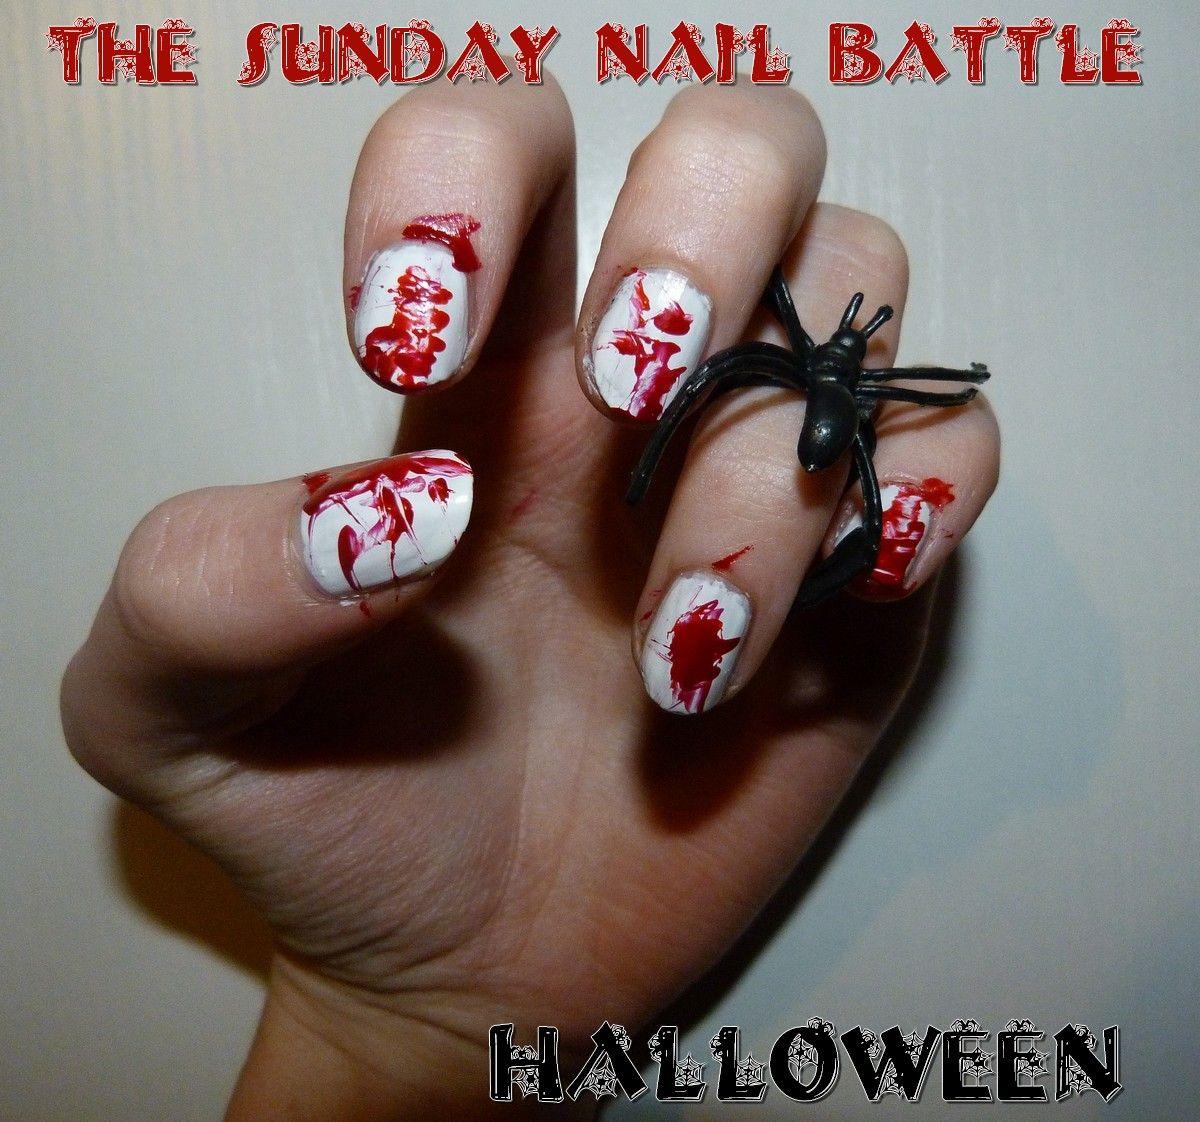 Pins check out www mynailpolishobsession com for more nail art ideas - Halloween Nail Art Dexter Check Out Www Mynailpolishobsession Com For More Nail Art Ideas